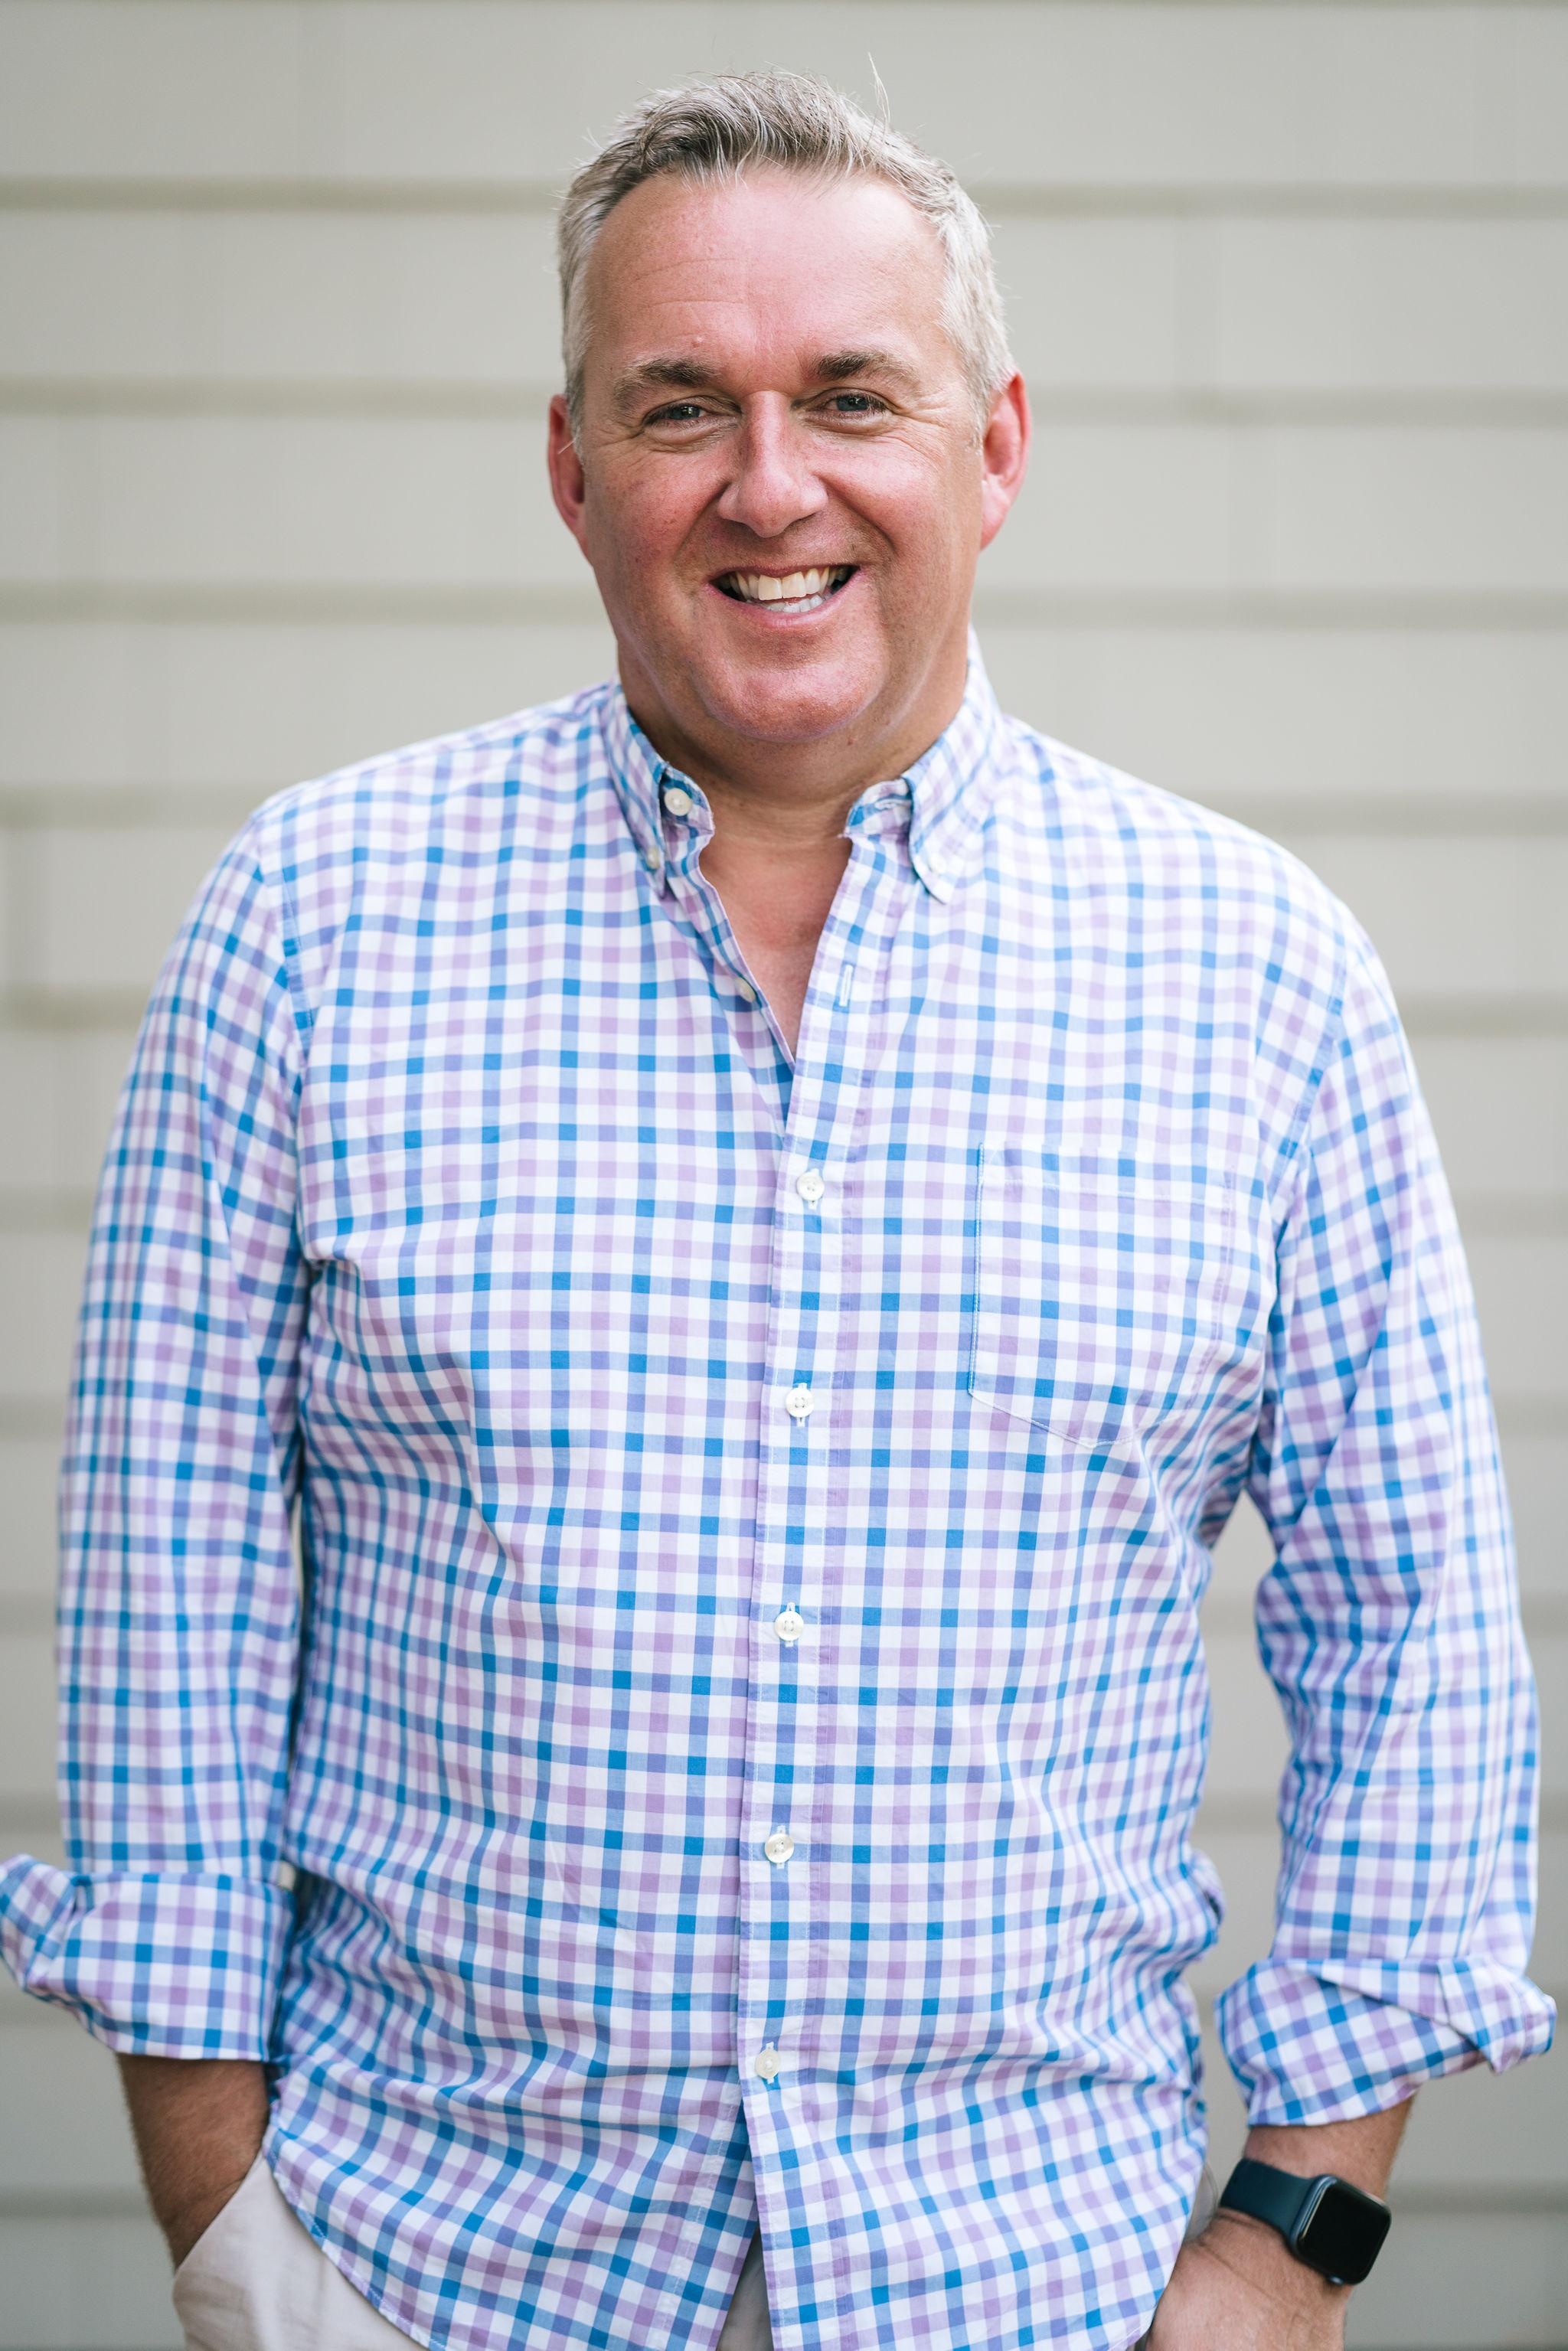 Steve Cockram, Co-Founder